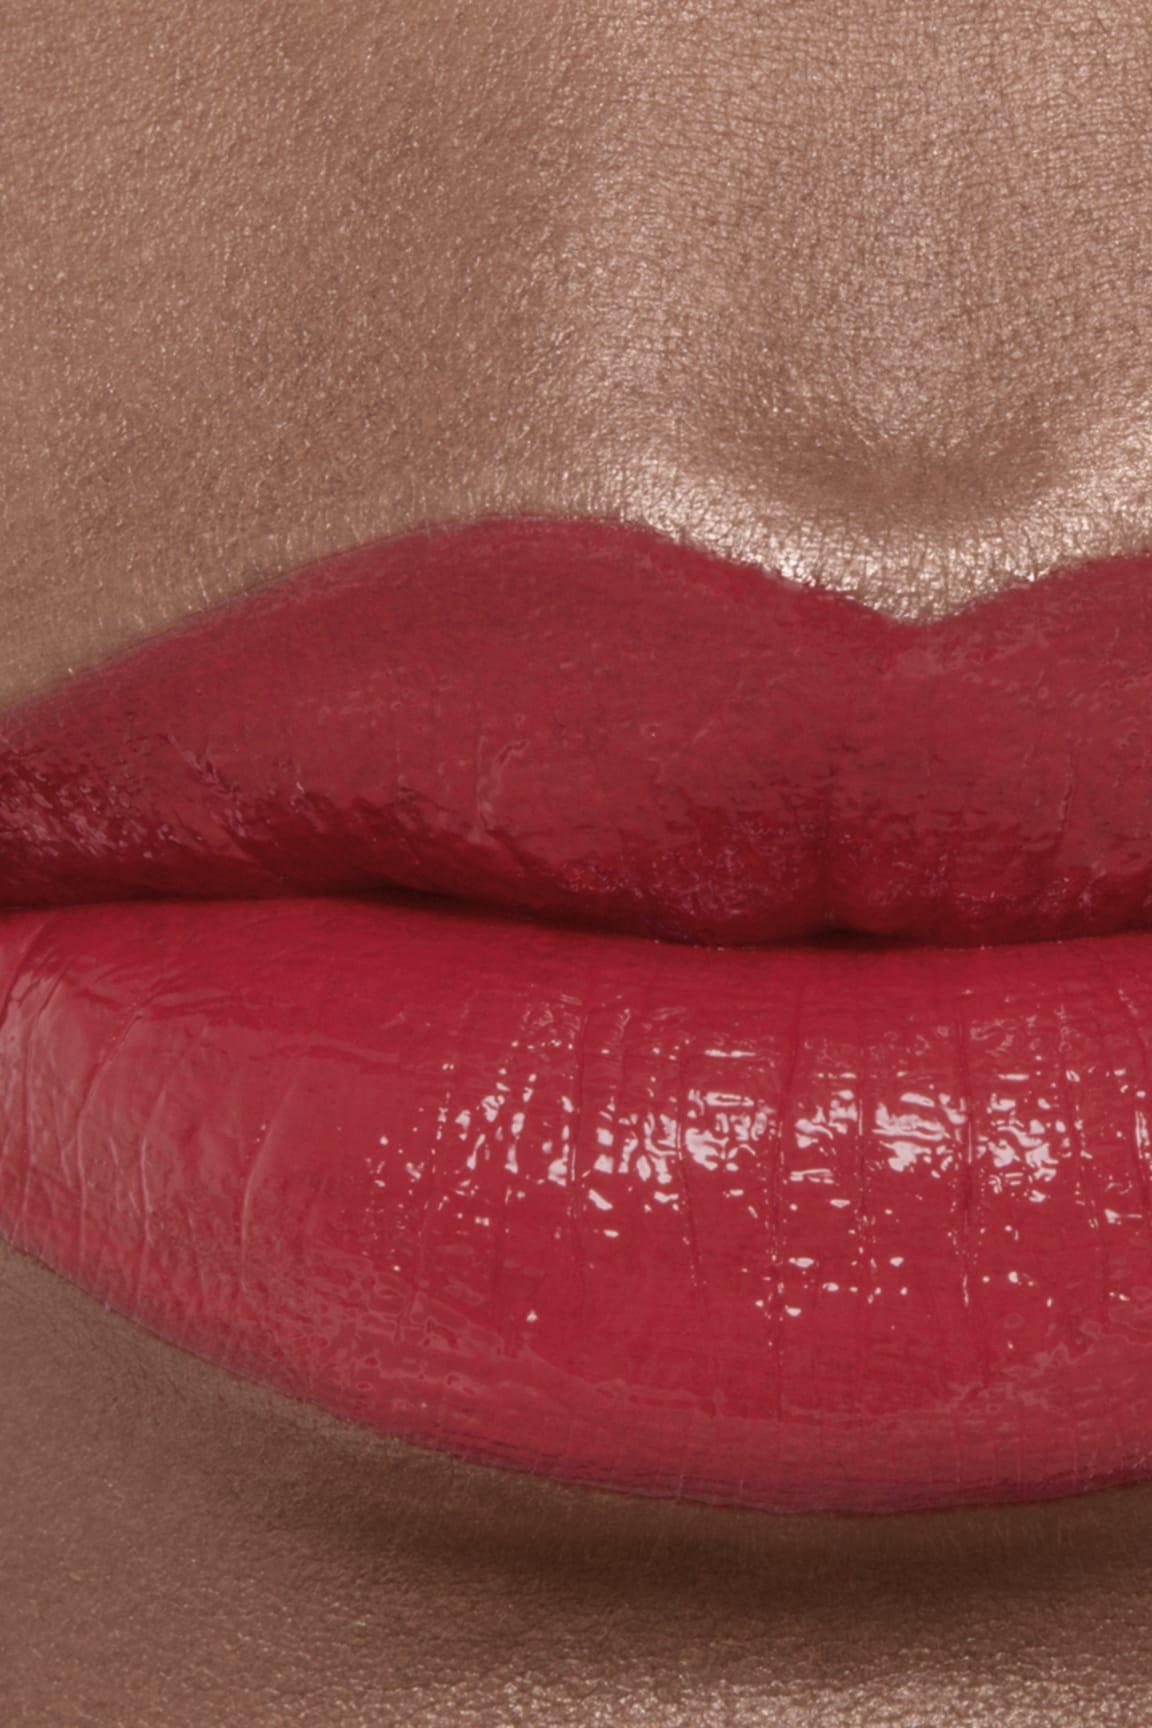 Application makeup visual 2 - ROUGE COCO BLOOM 132 - VIVACITY